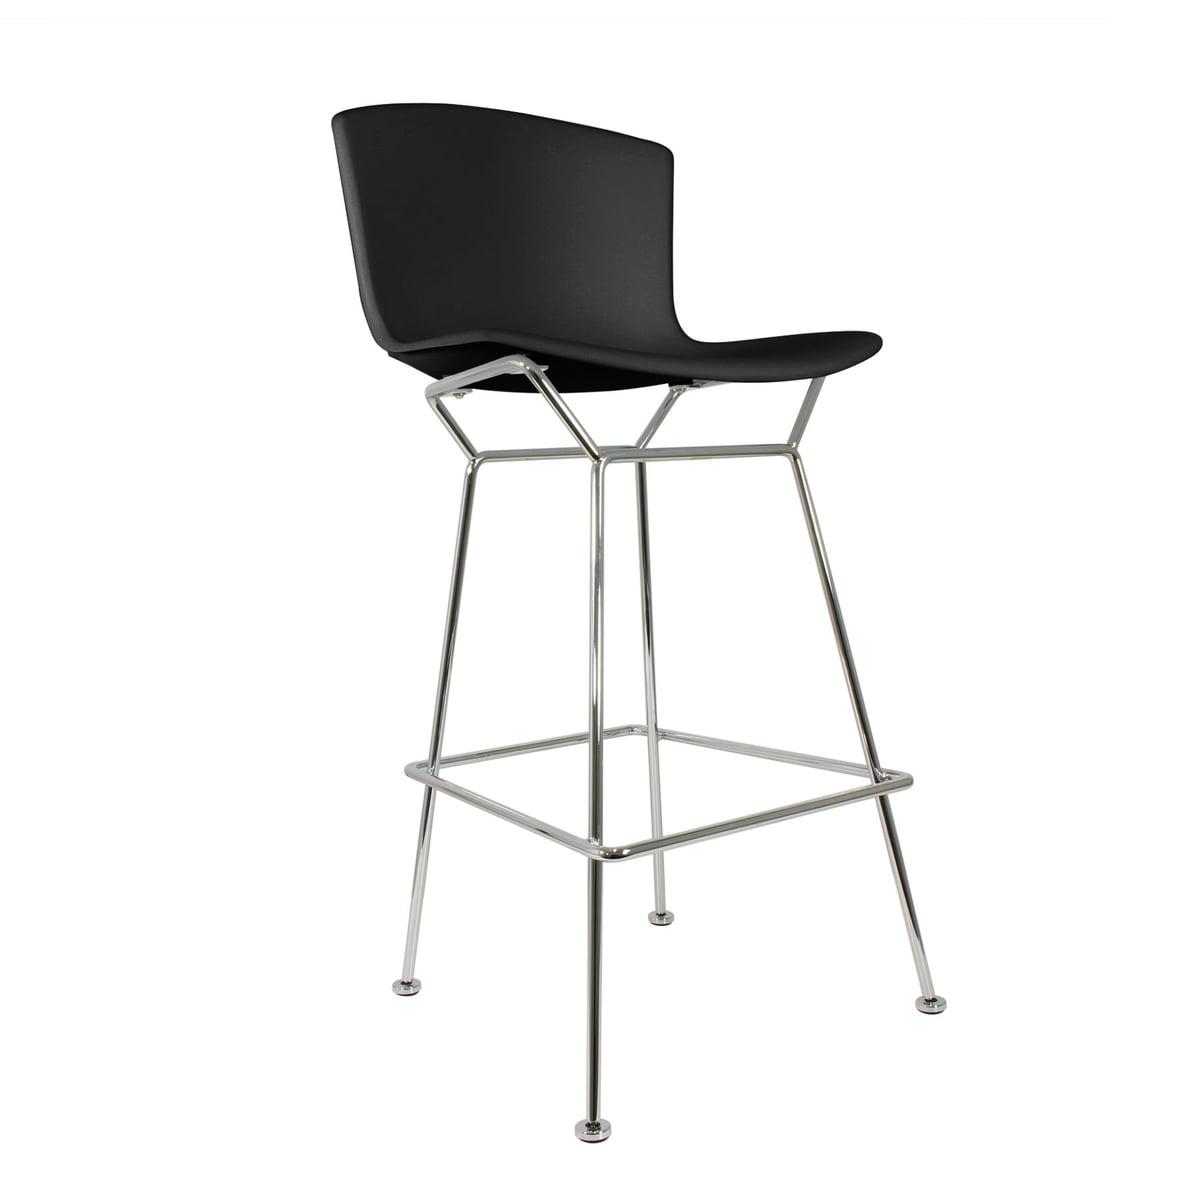 bertoia tabouret de bar par knoll. Black Bedroom Furniture Sets. Home Design Ideas